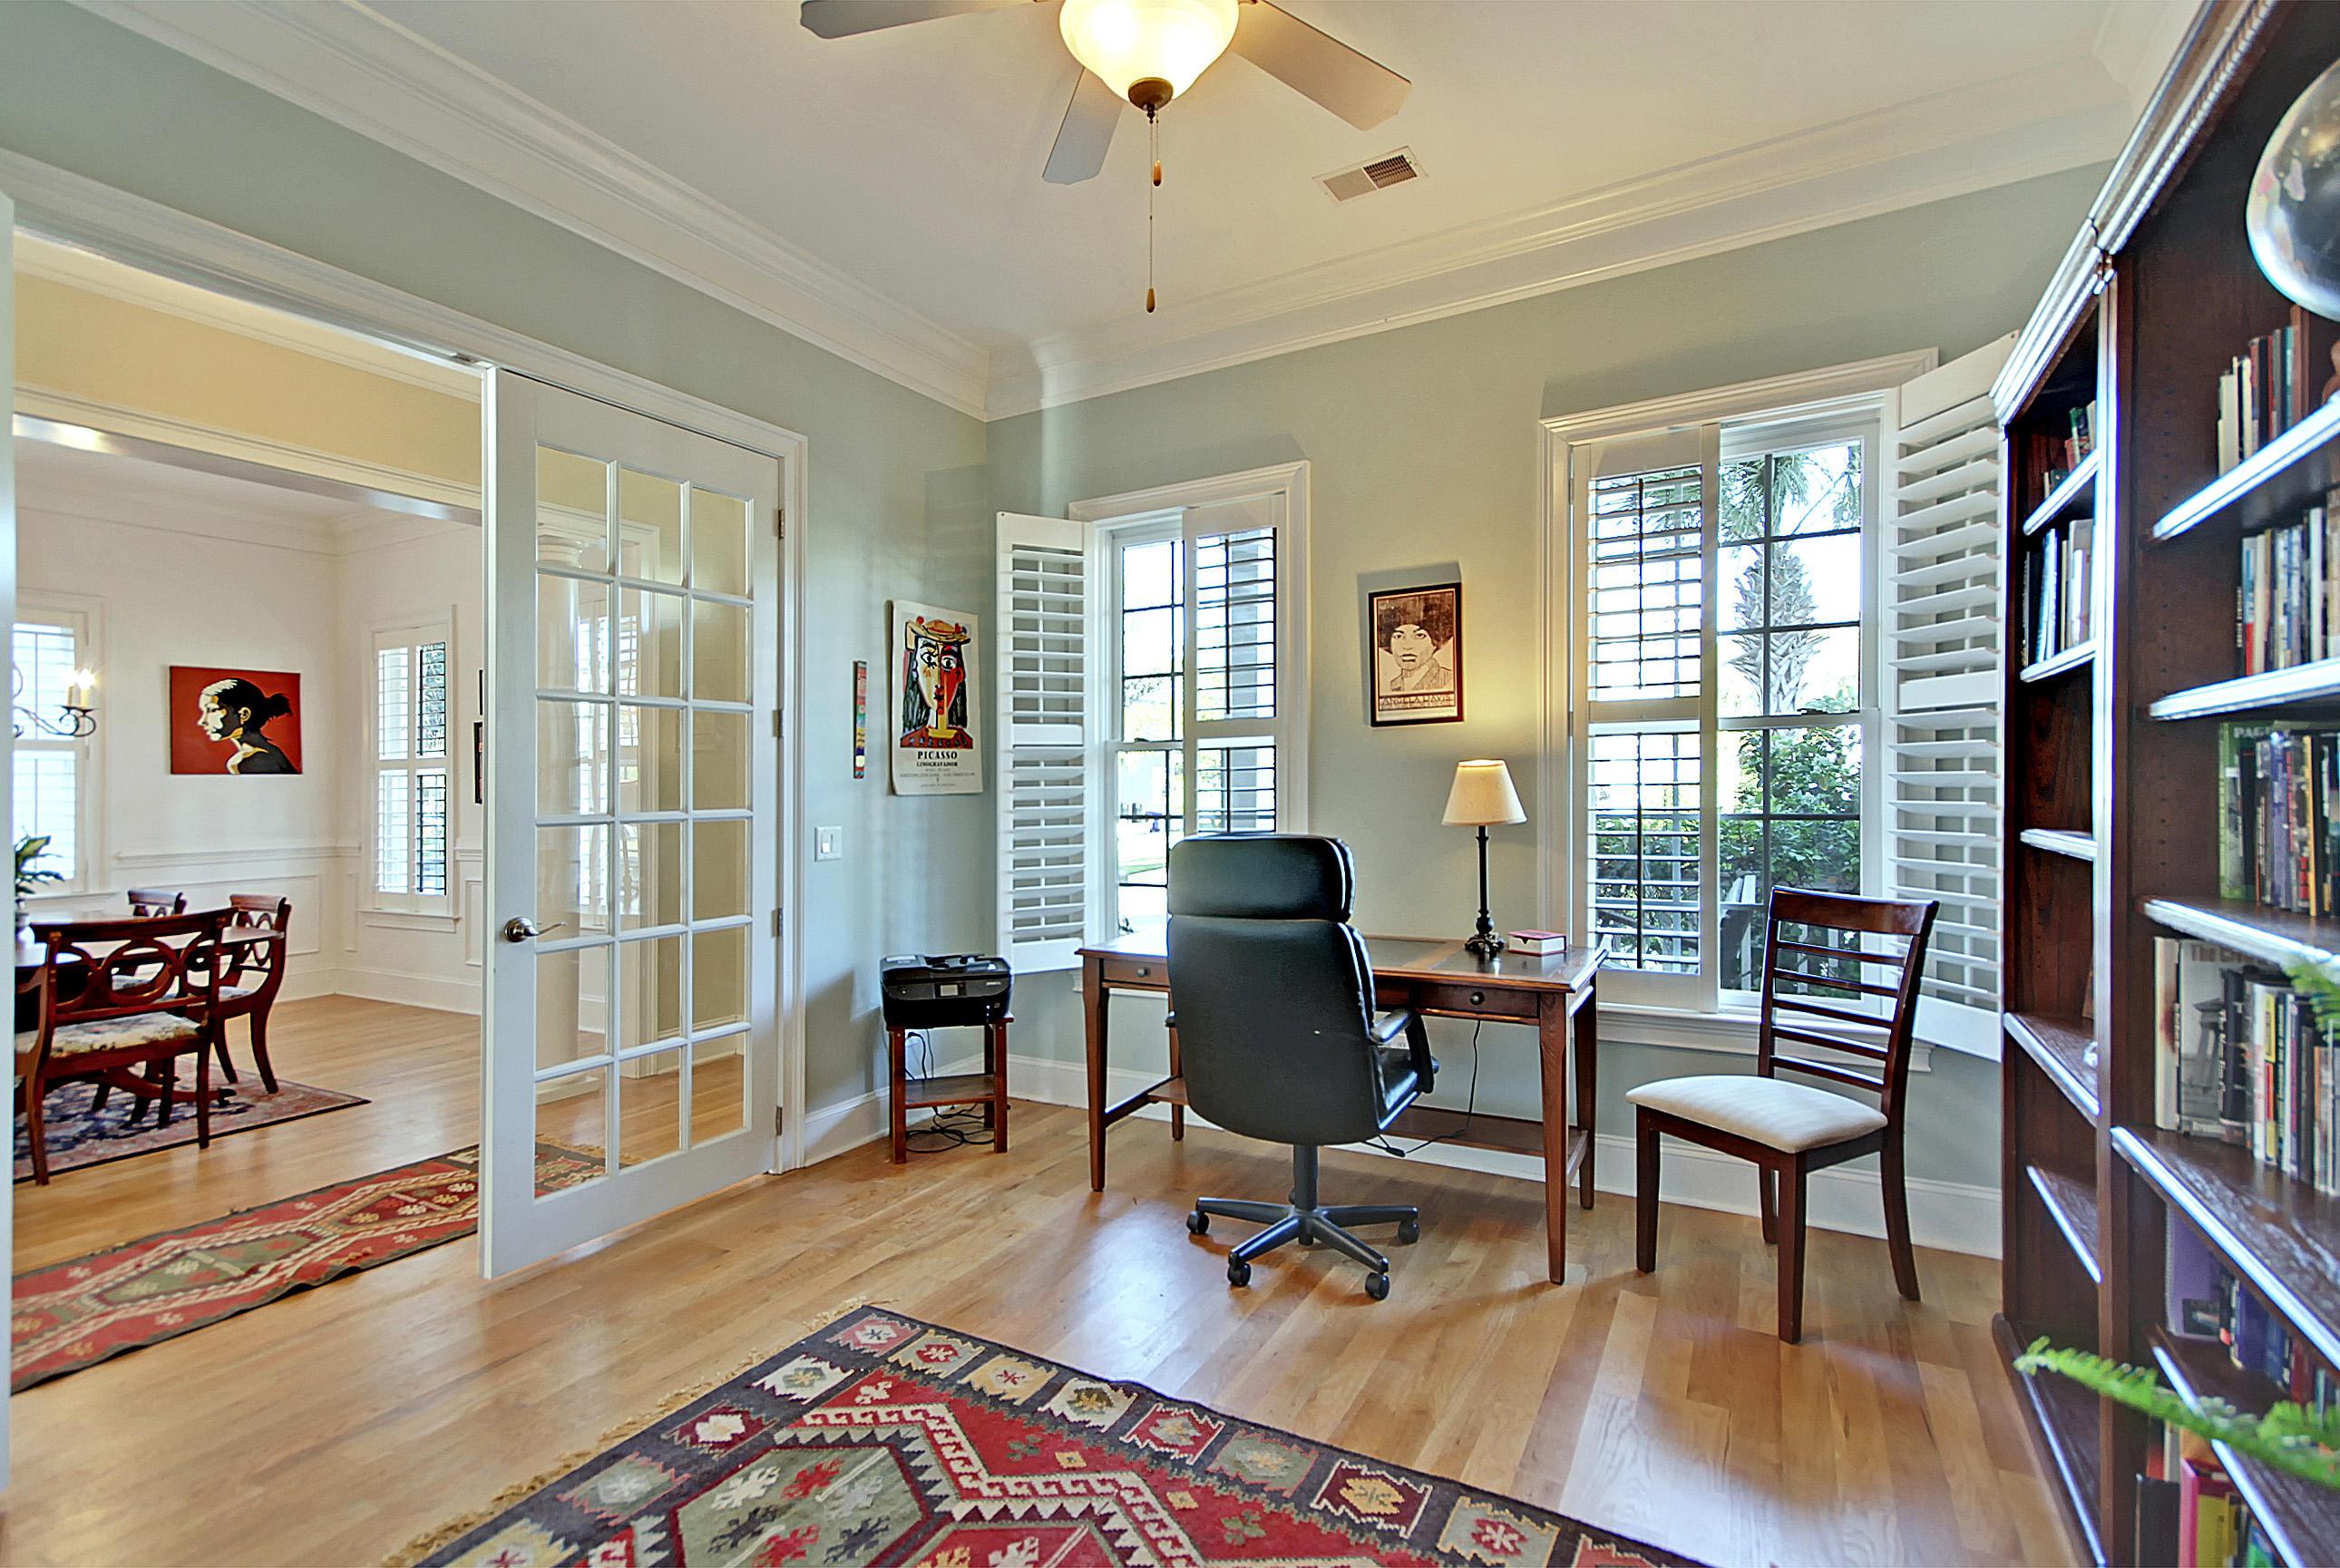 Cloudbreak Court Homes For Sale - 638 Cloudbreak, Charleston, SC - 16